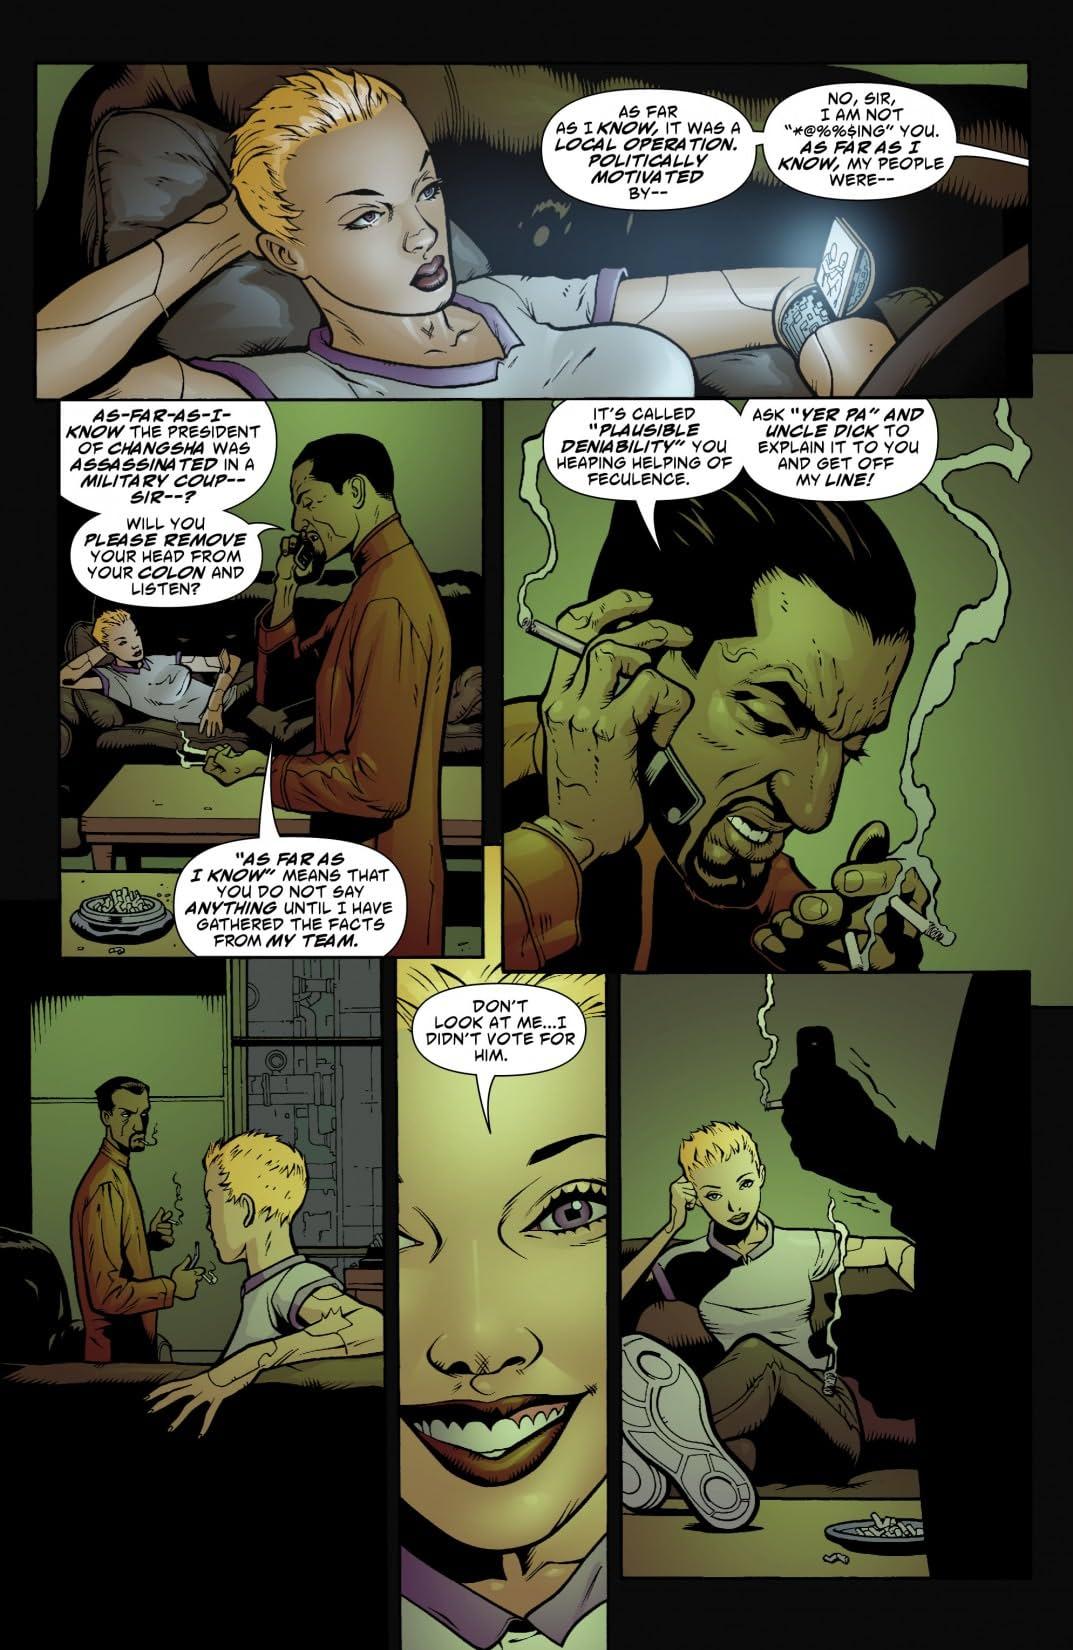 Justice League Elite #4 (of 12)